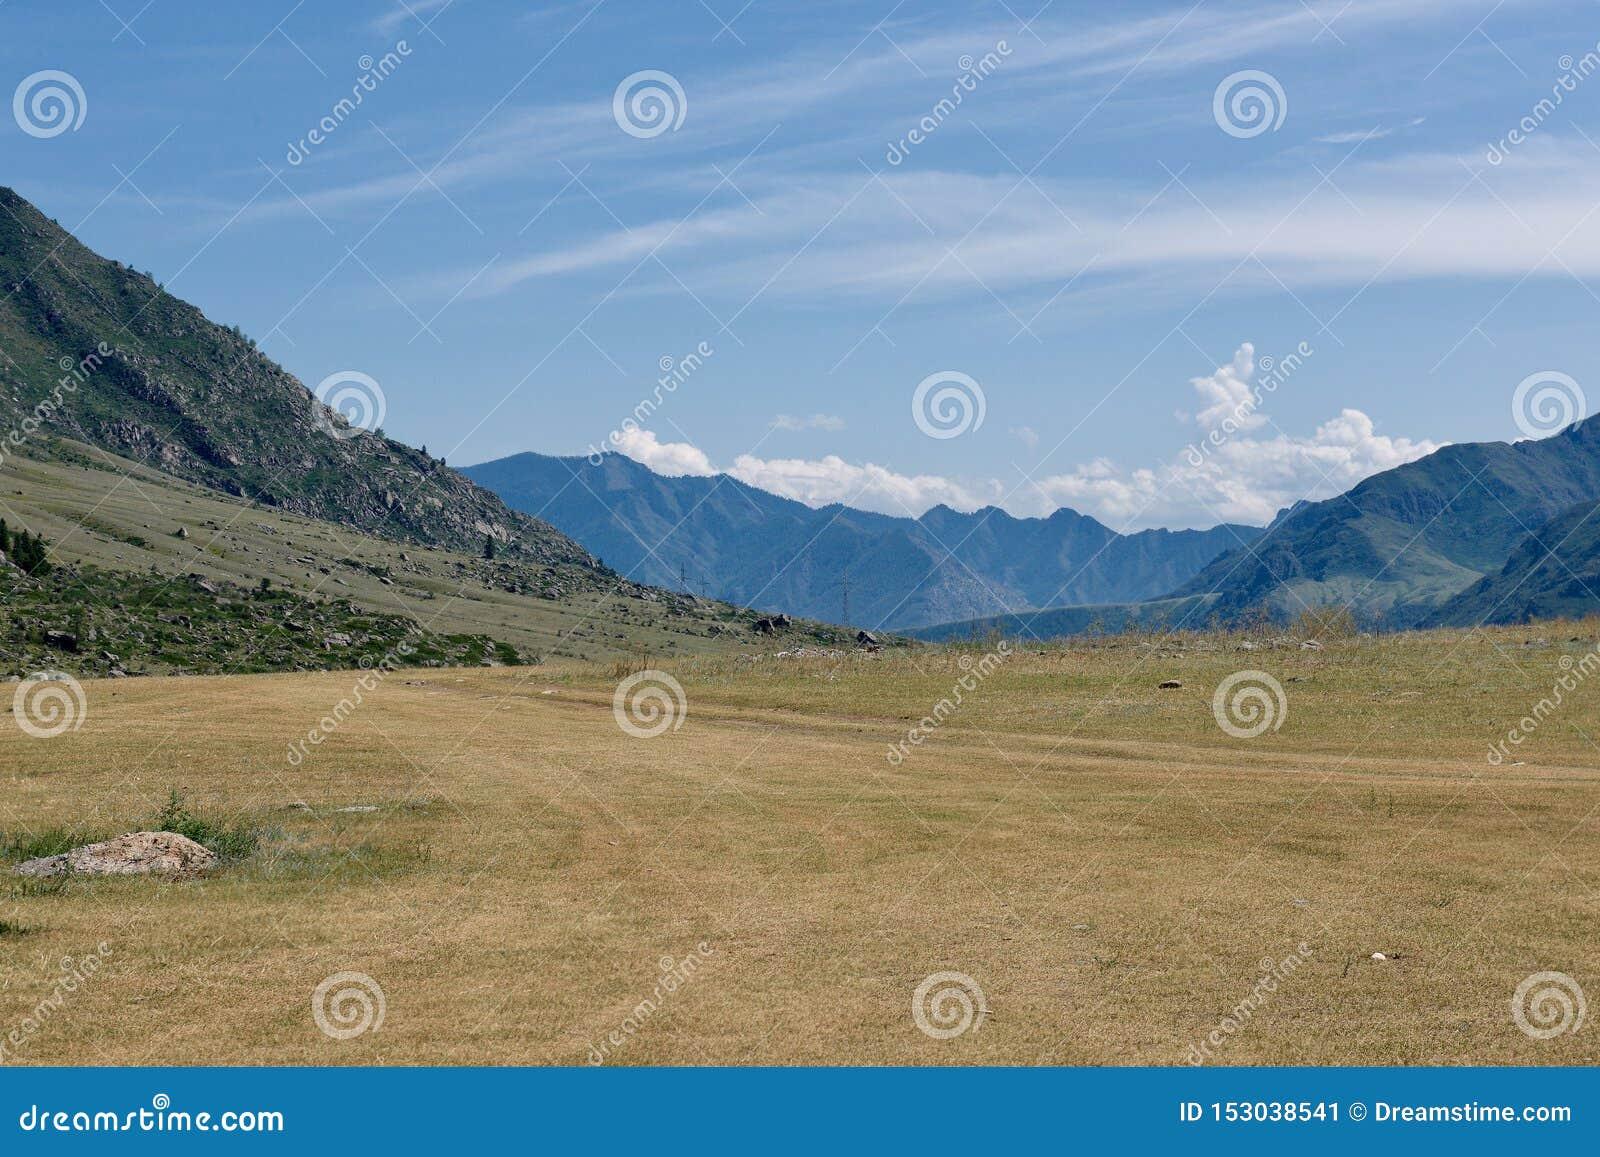 Gorny Altai, Siberia, Russian Federation.